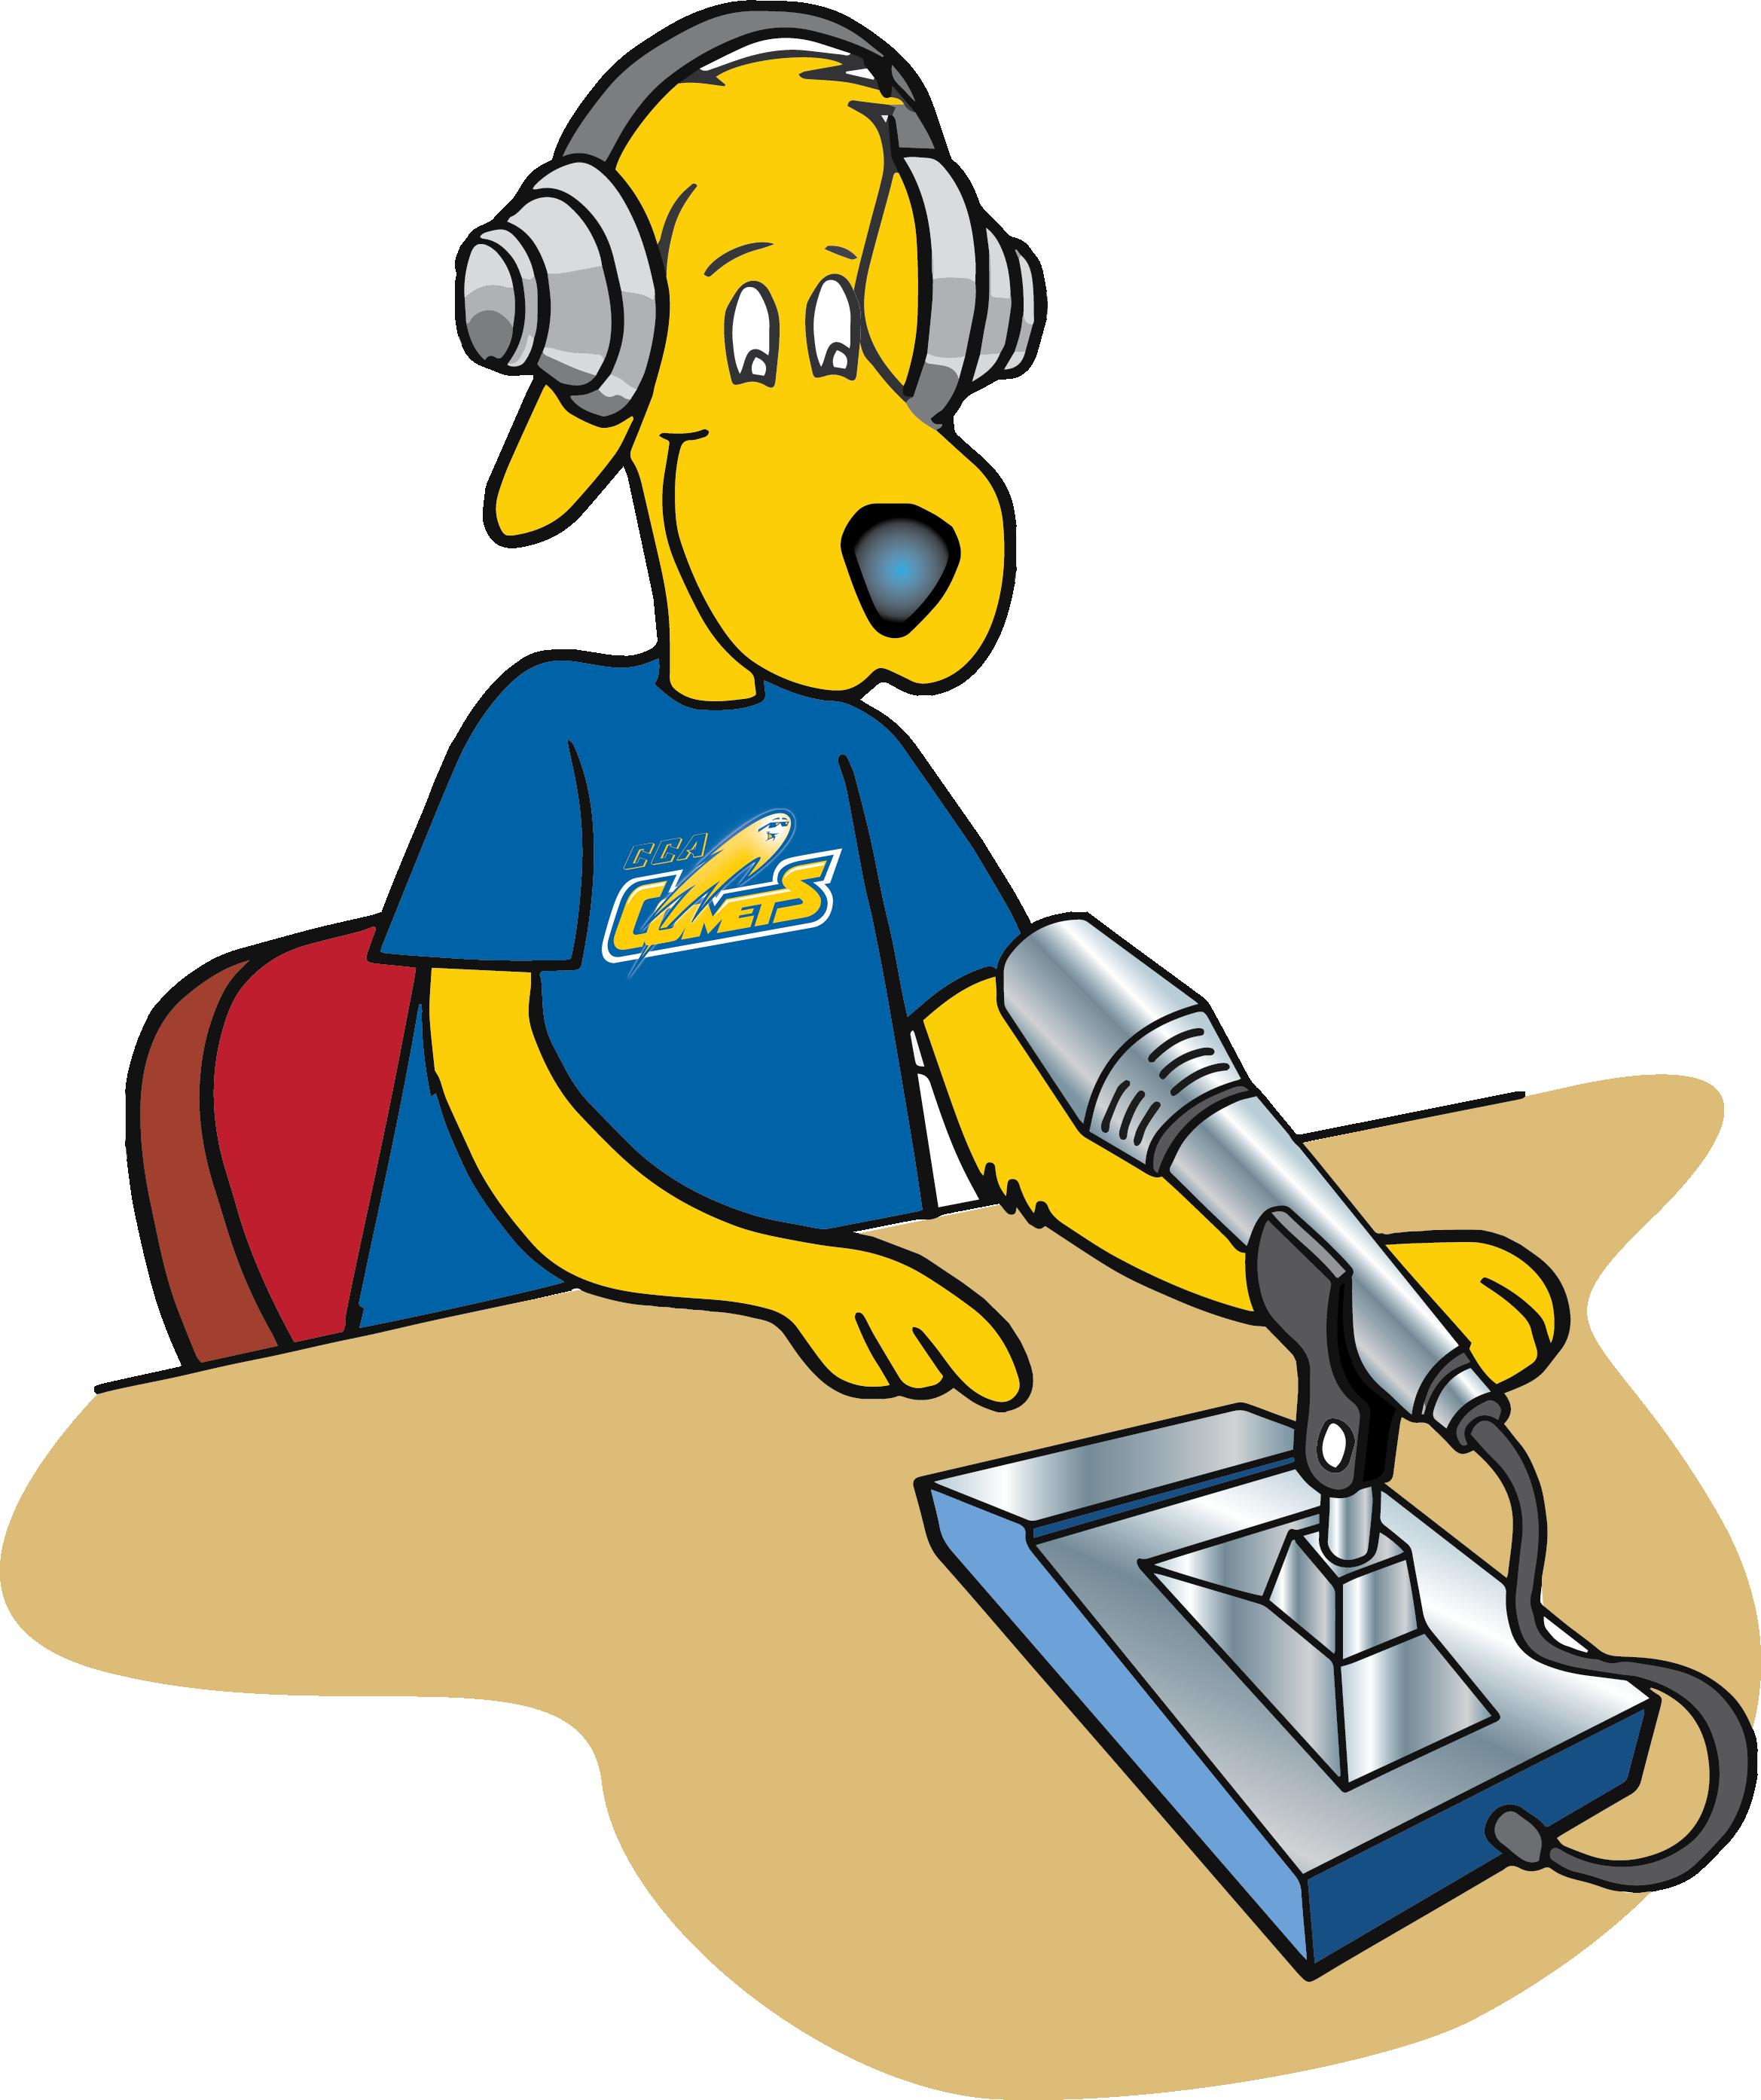 CCA's Comet the dog podcast logo